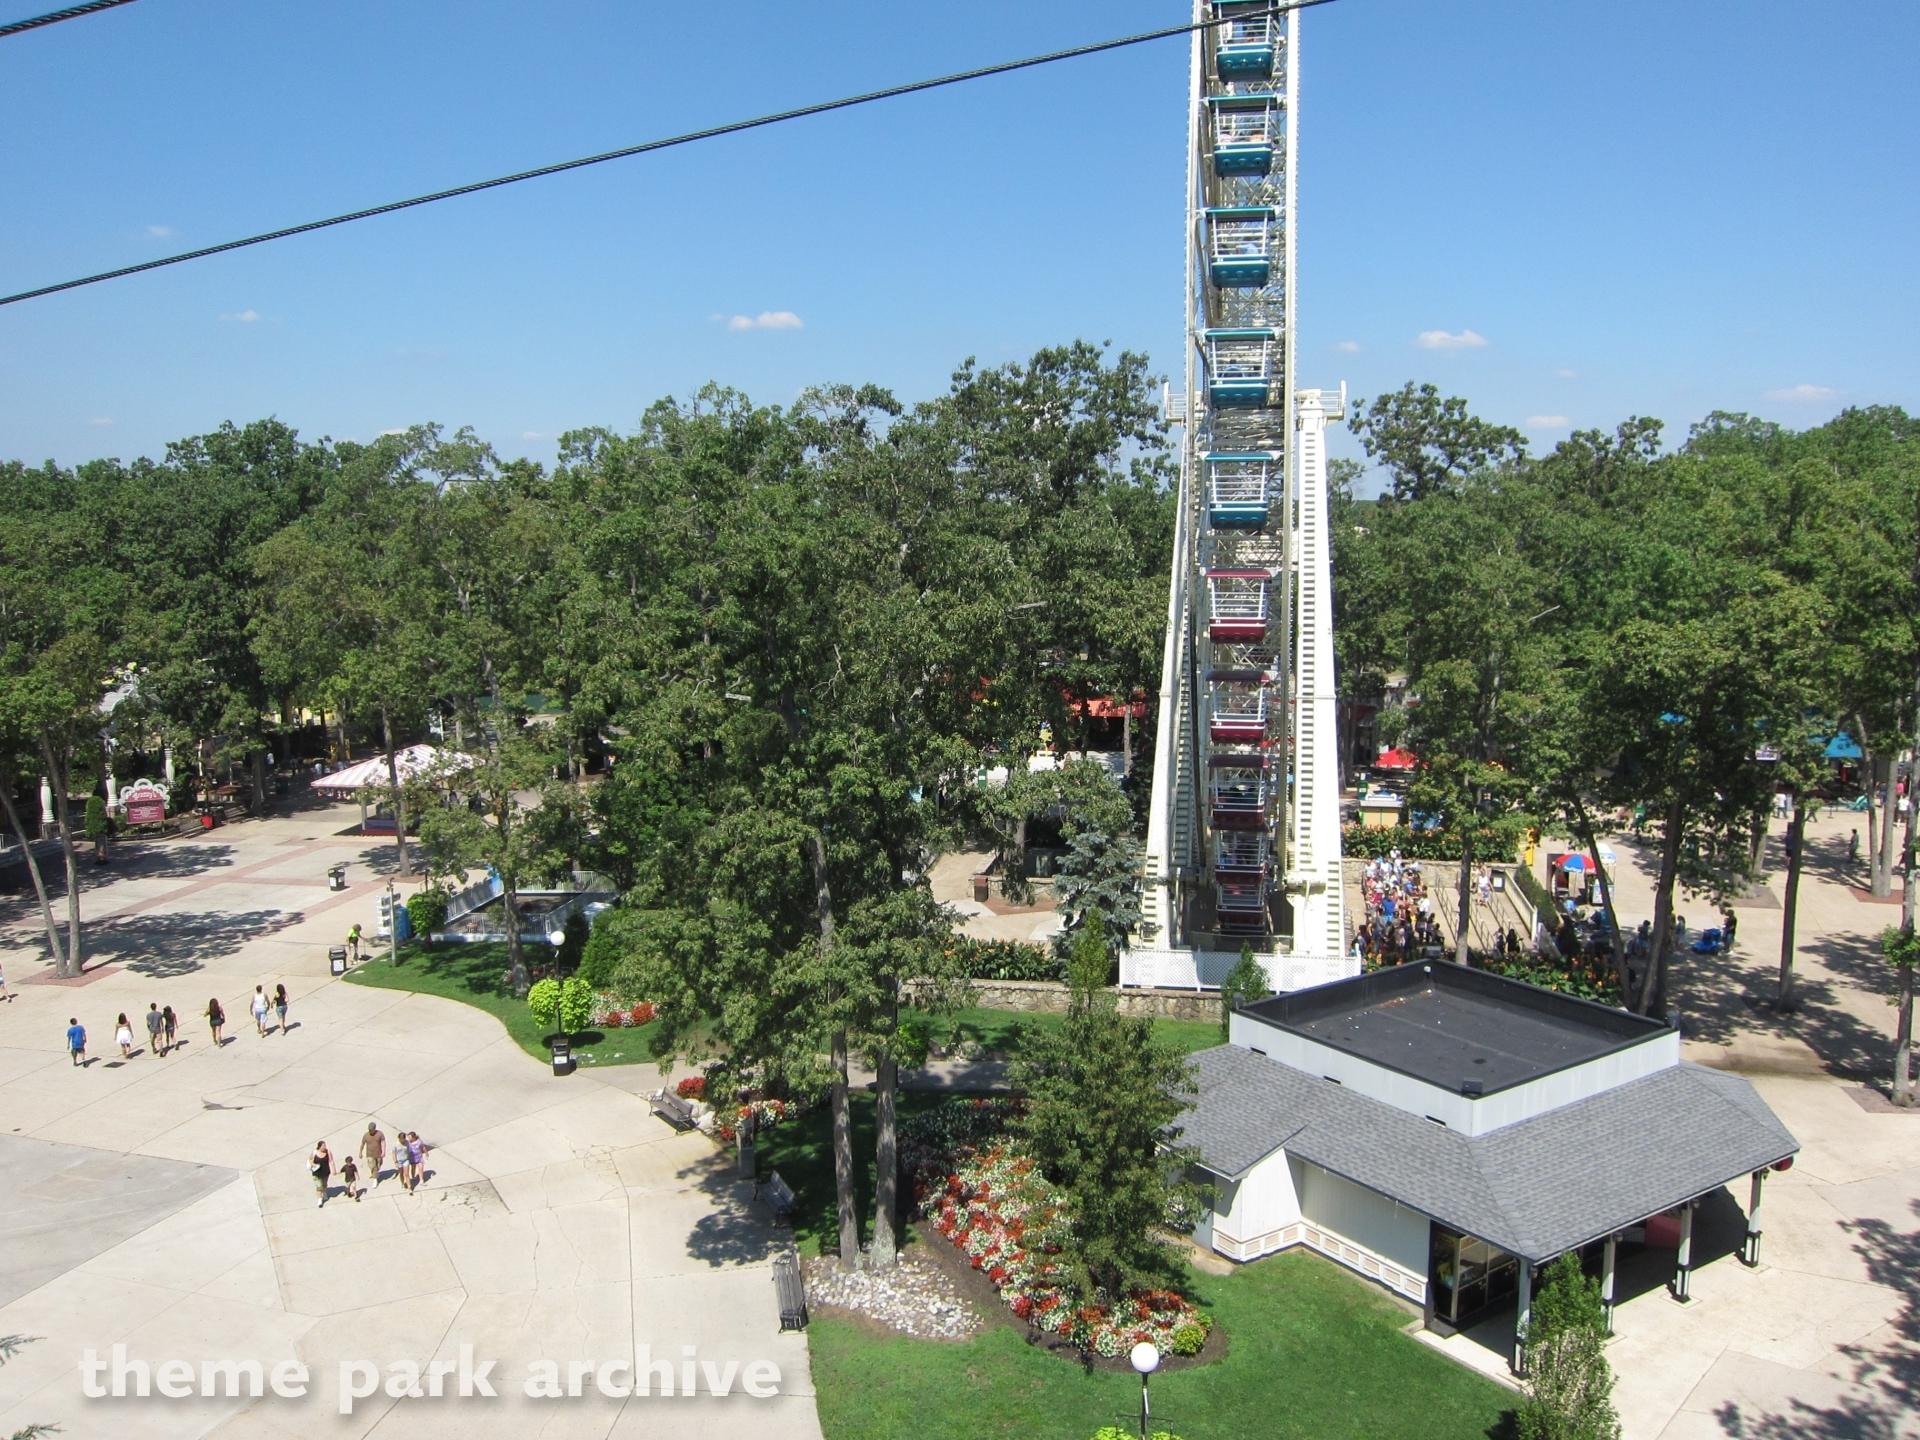 Big Wheel at Six Flags Great Adventure